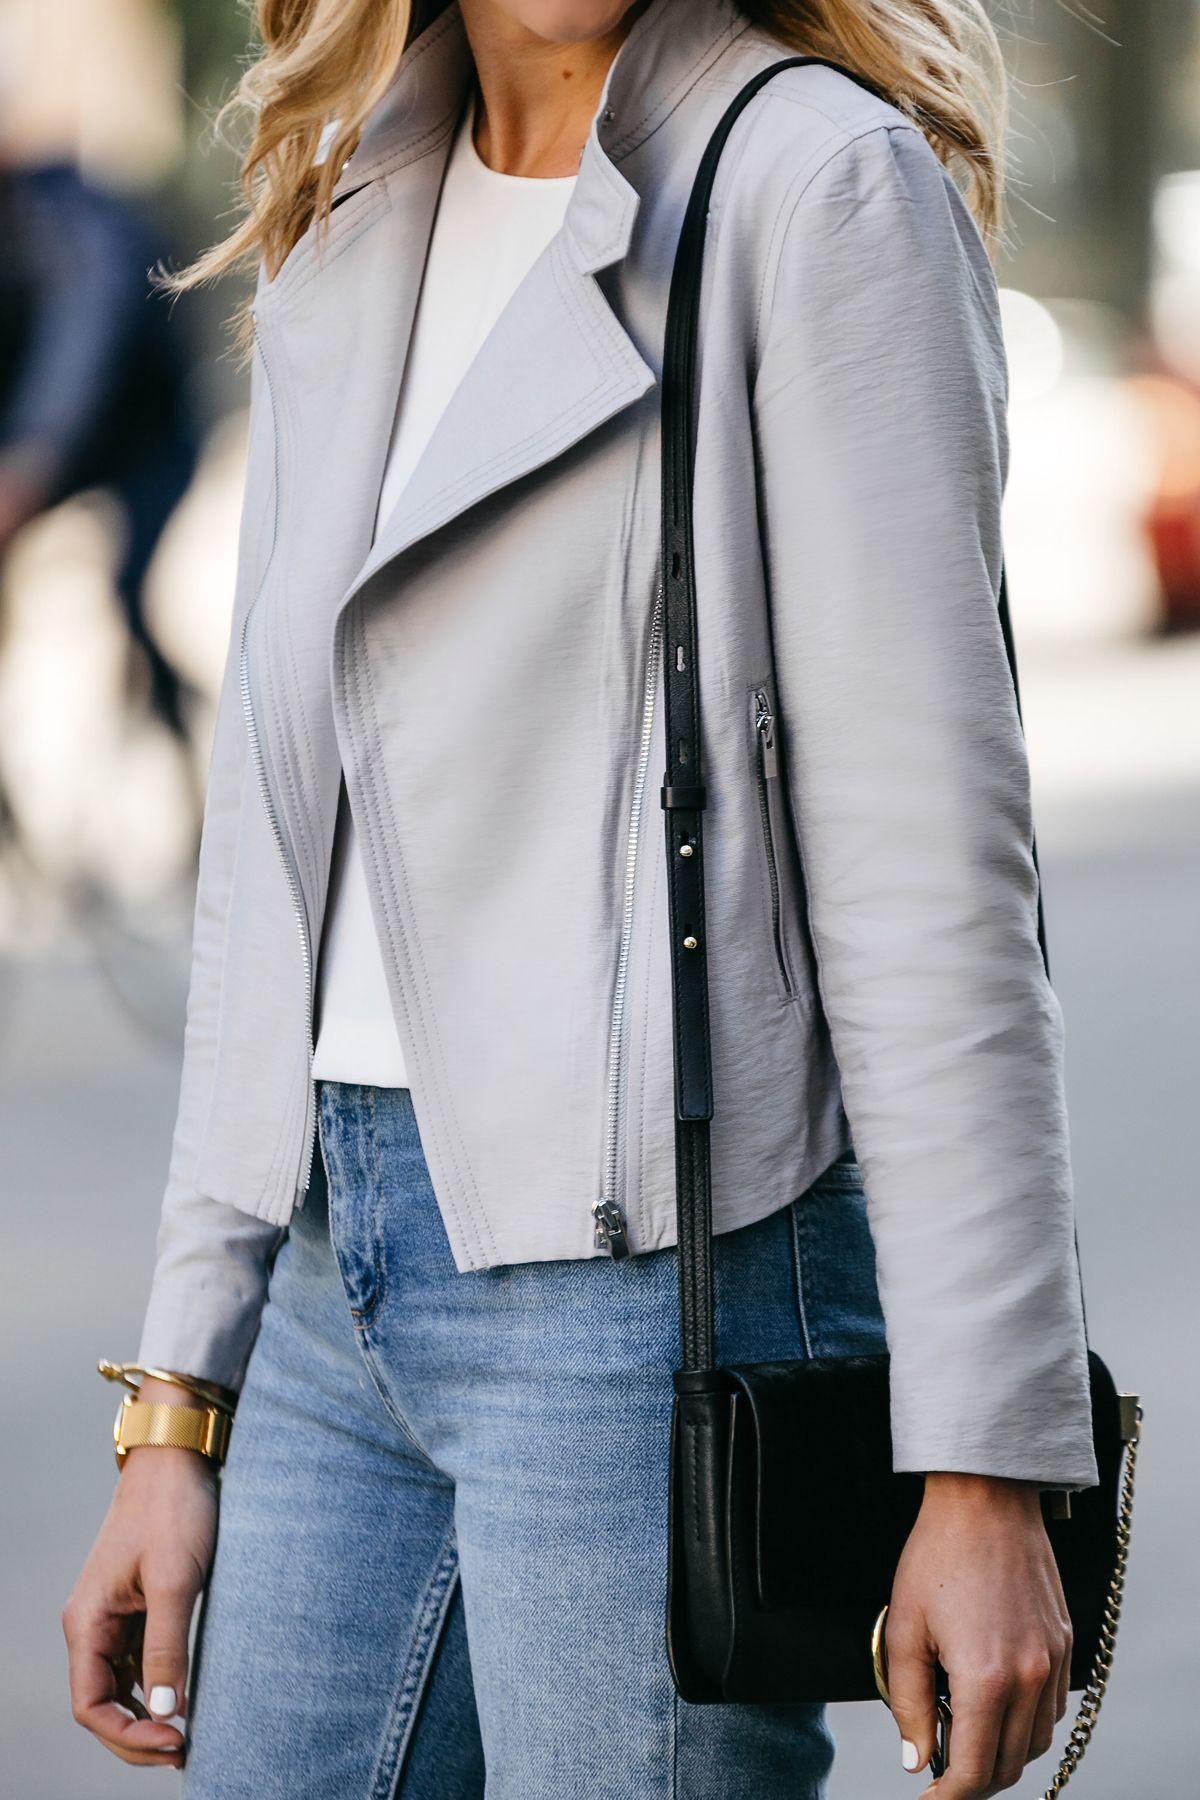 Top Fashion Bloggers In Dallas - Fashion jackson dallas blogger fashion blogger street style club monaco tovah jacket